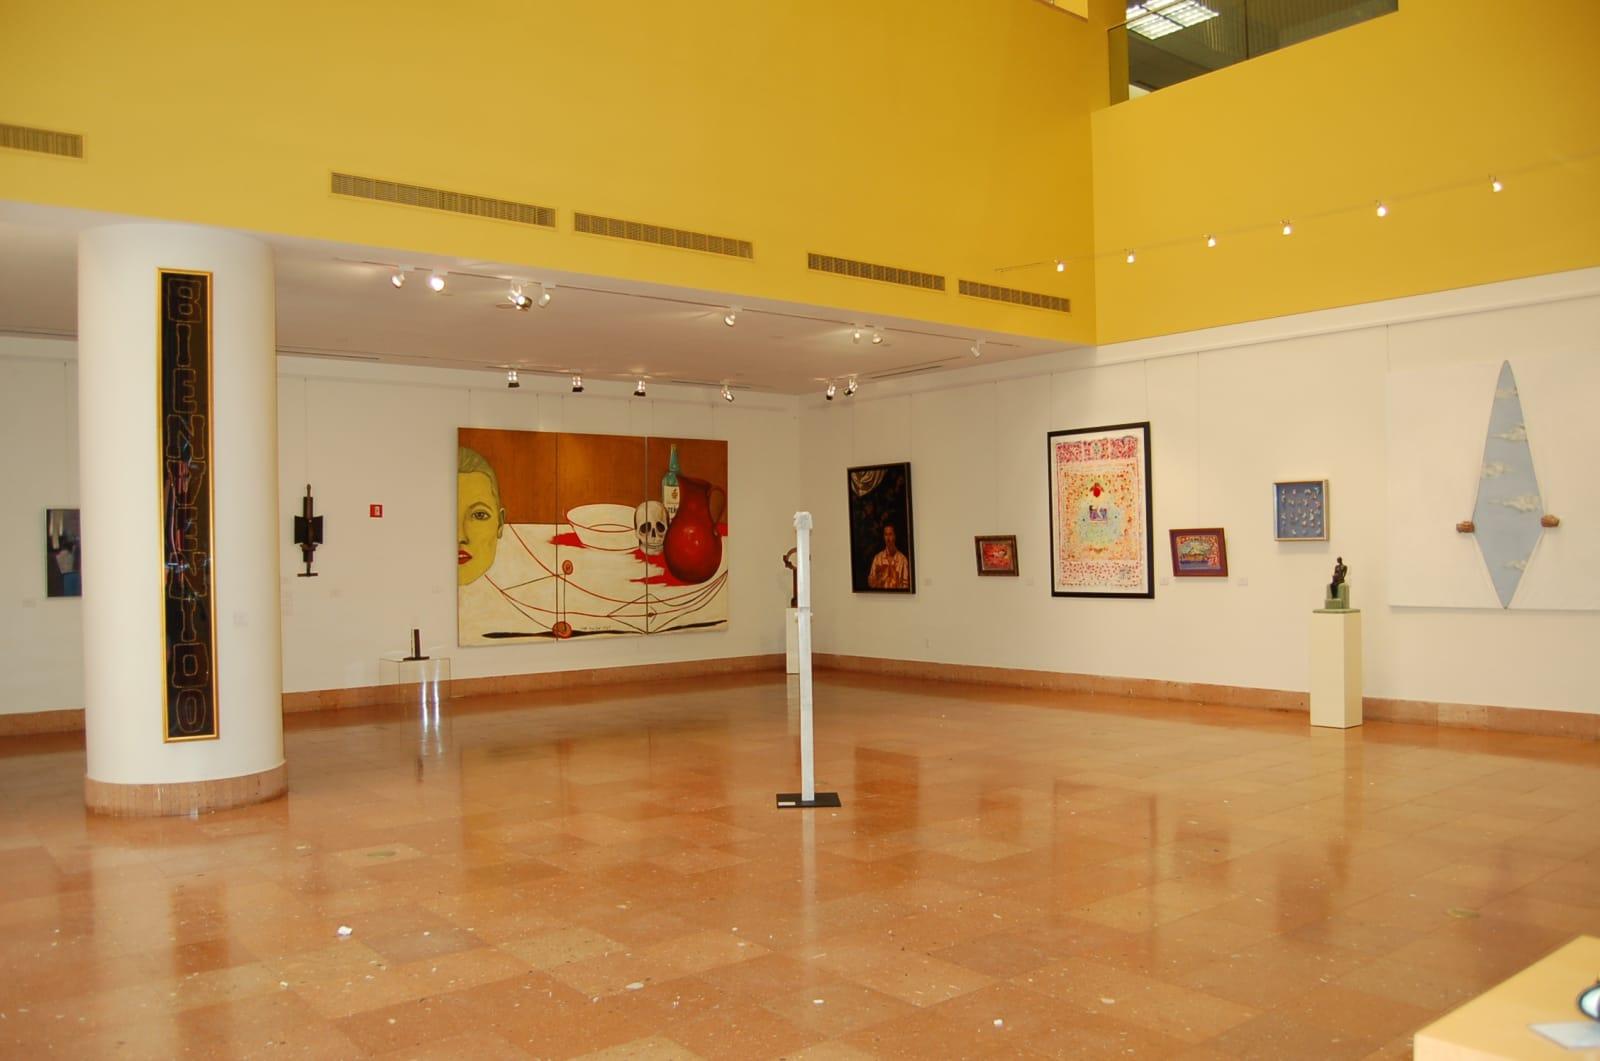 Beauty in Art: 21st Century Interpretations